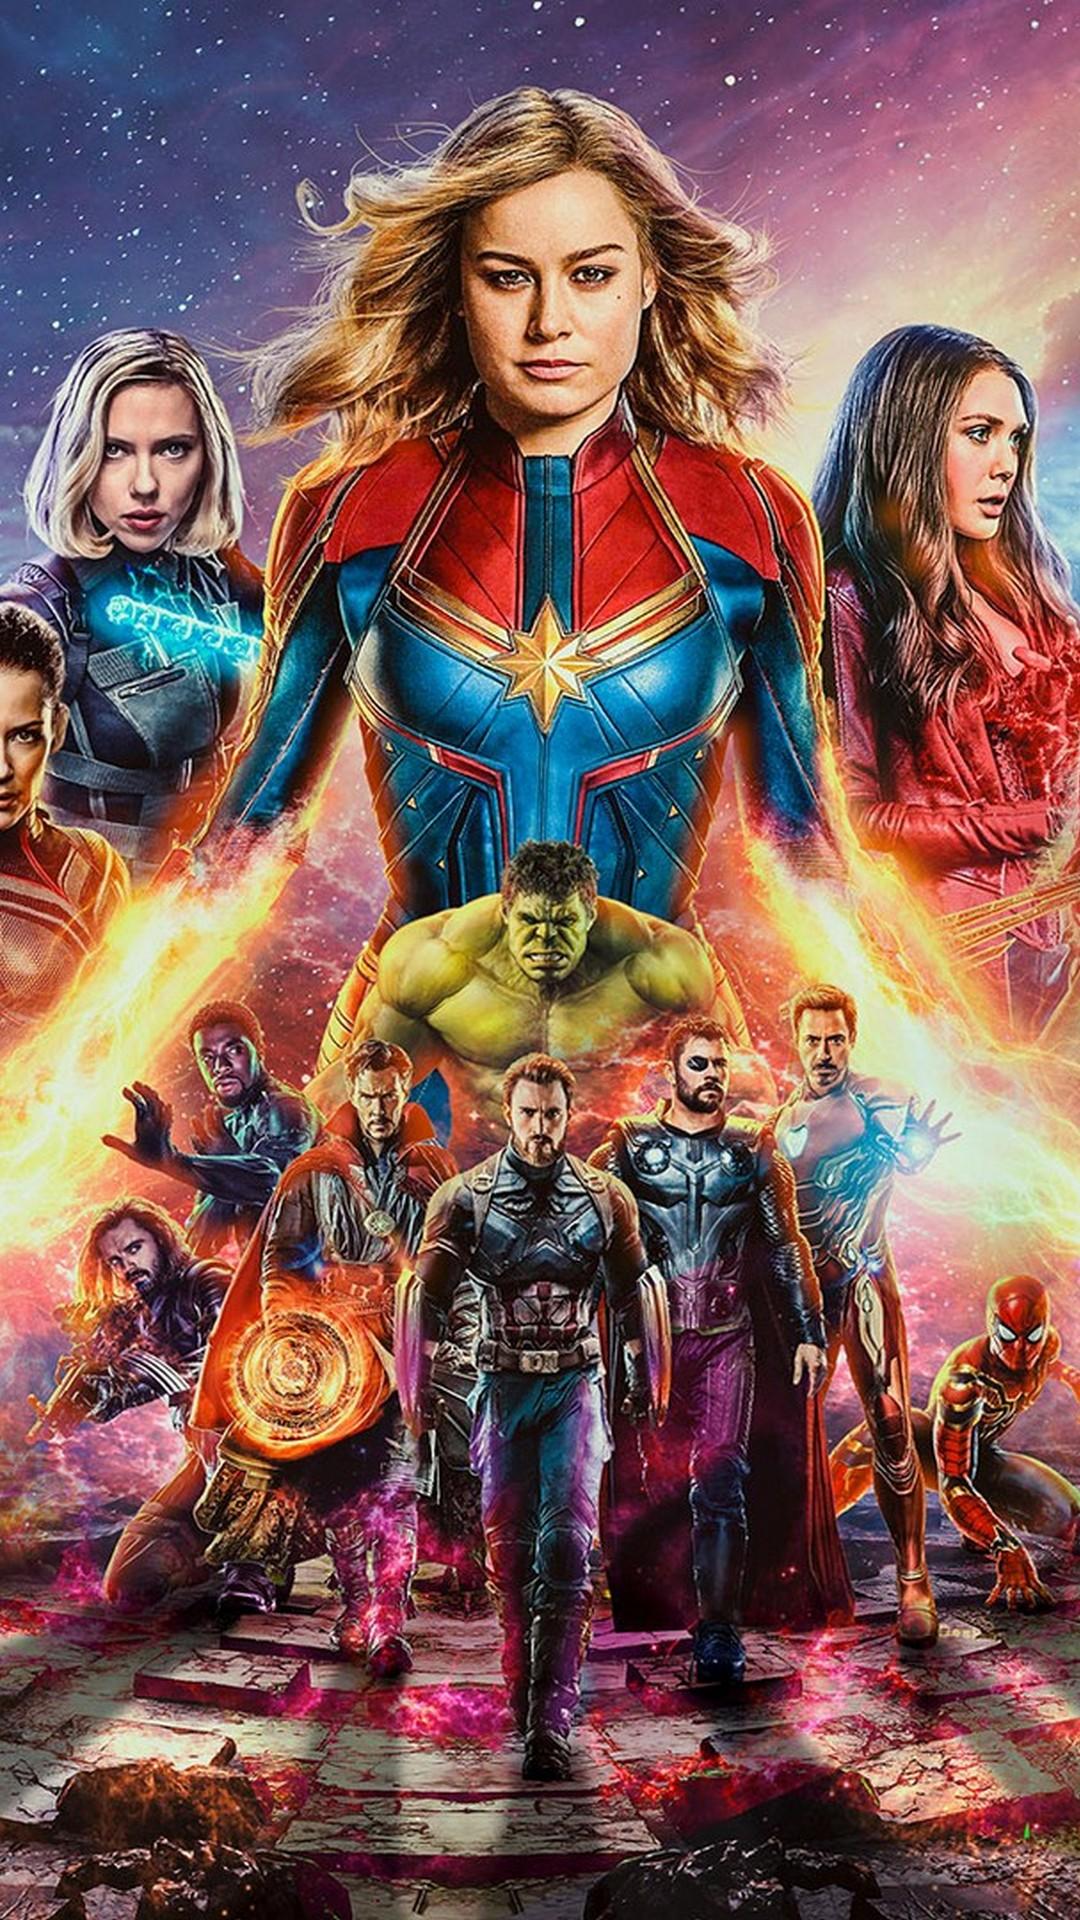 Avengers Endgame iPhone Wallpaper 2019 3D iPhone Wallpaper 1080x1920